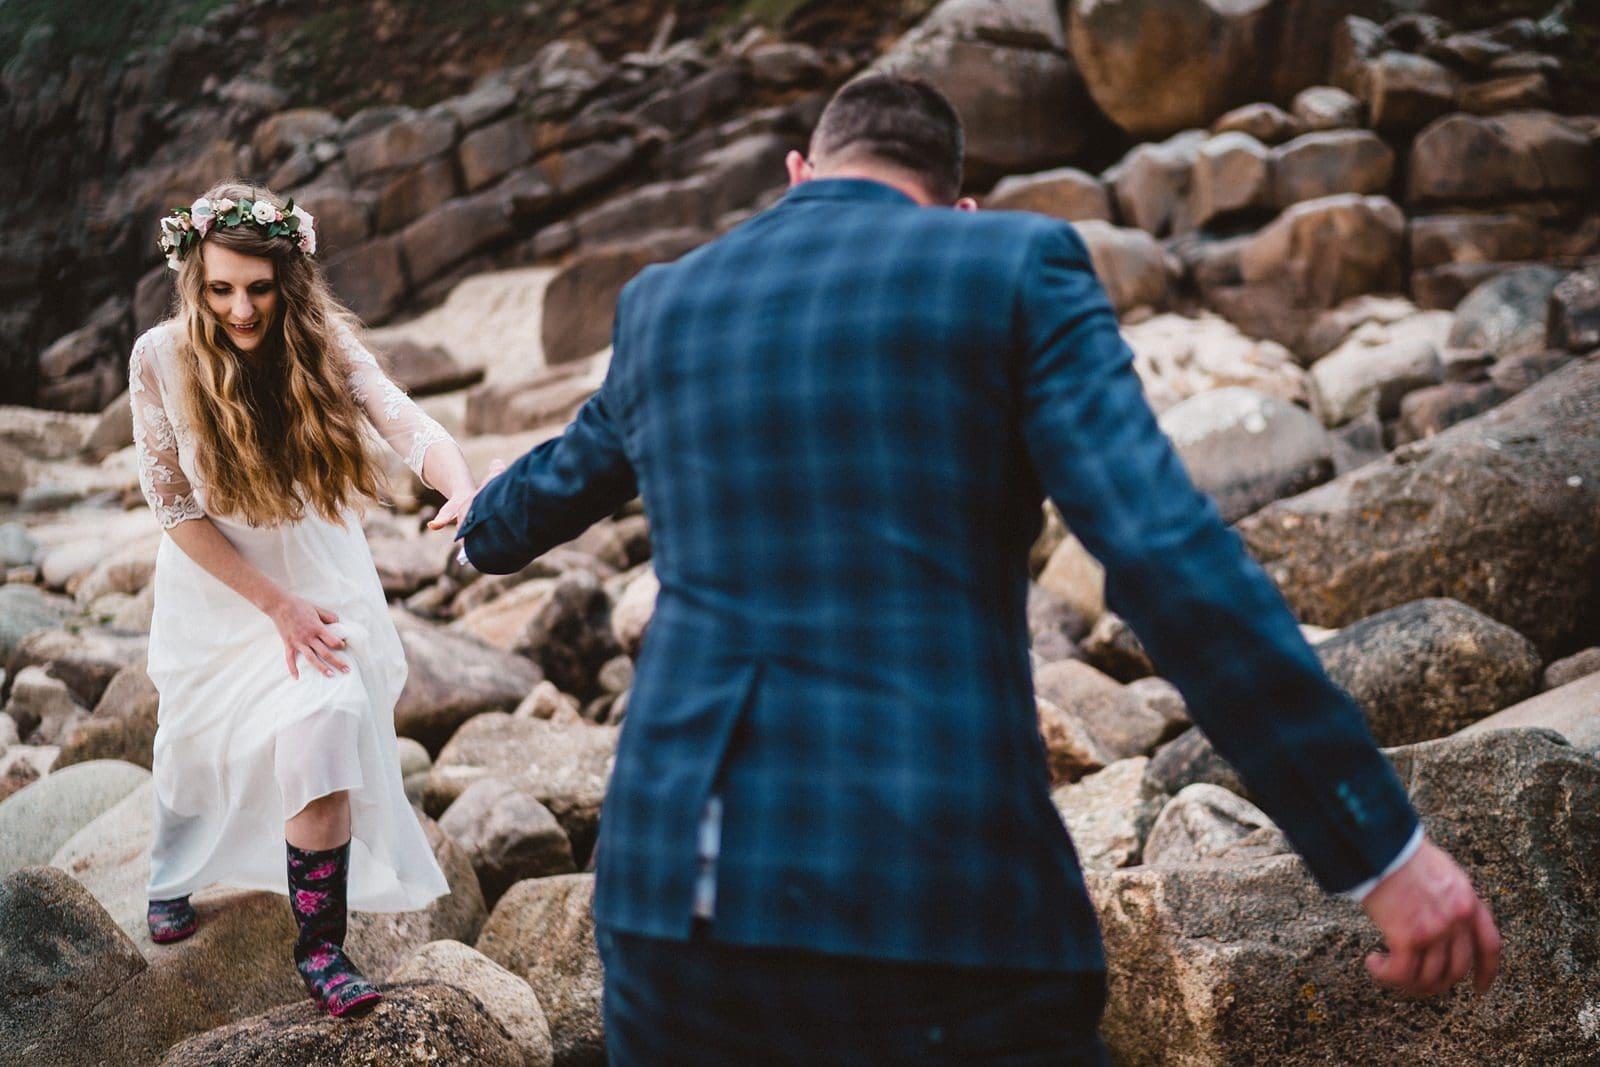 chypraze farm wedding photography